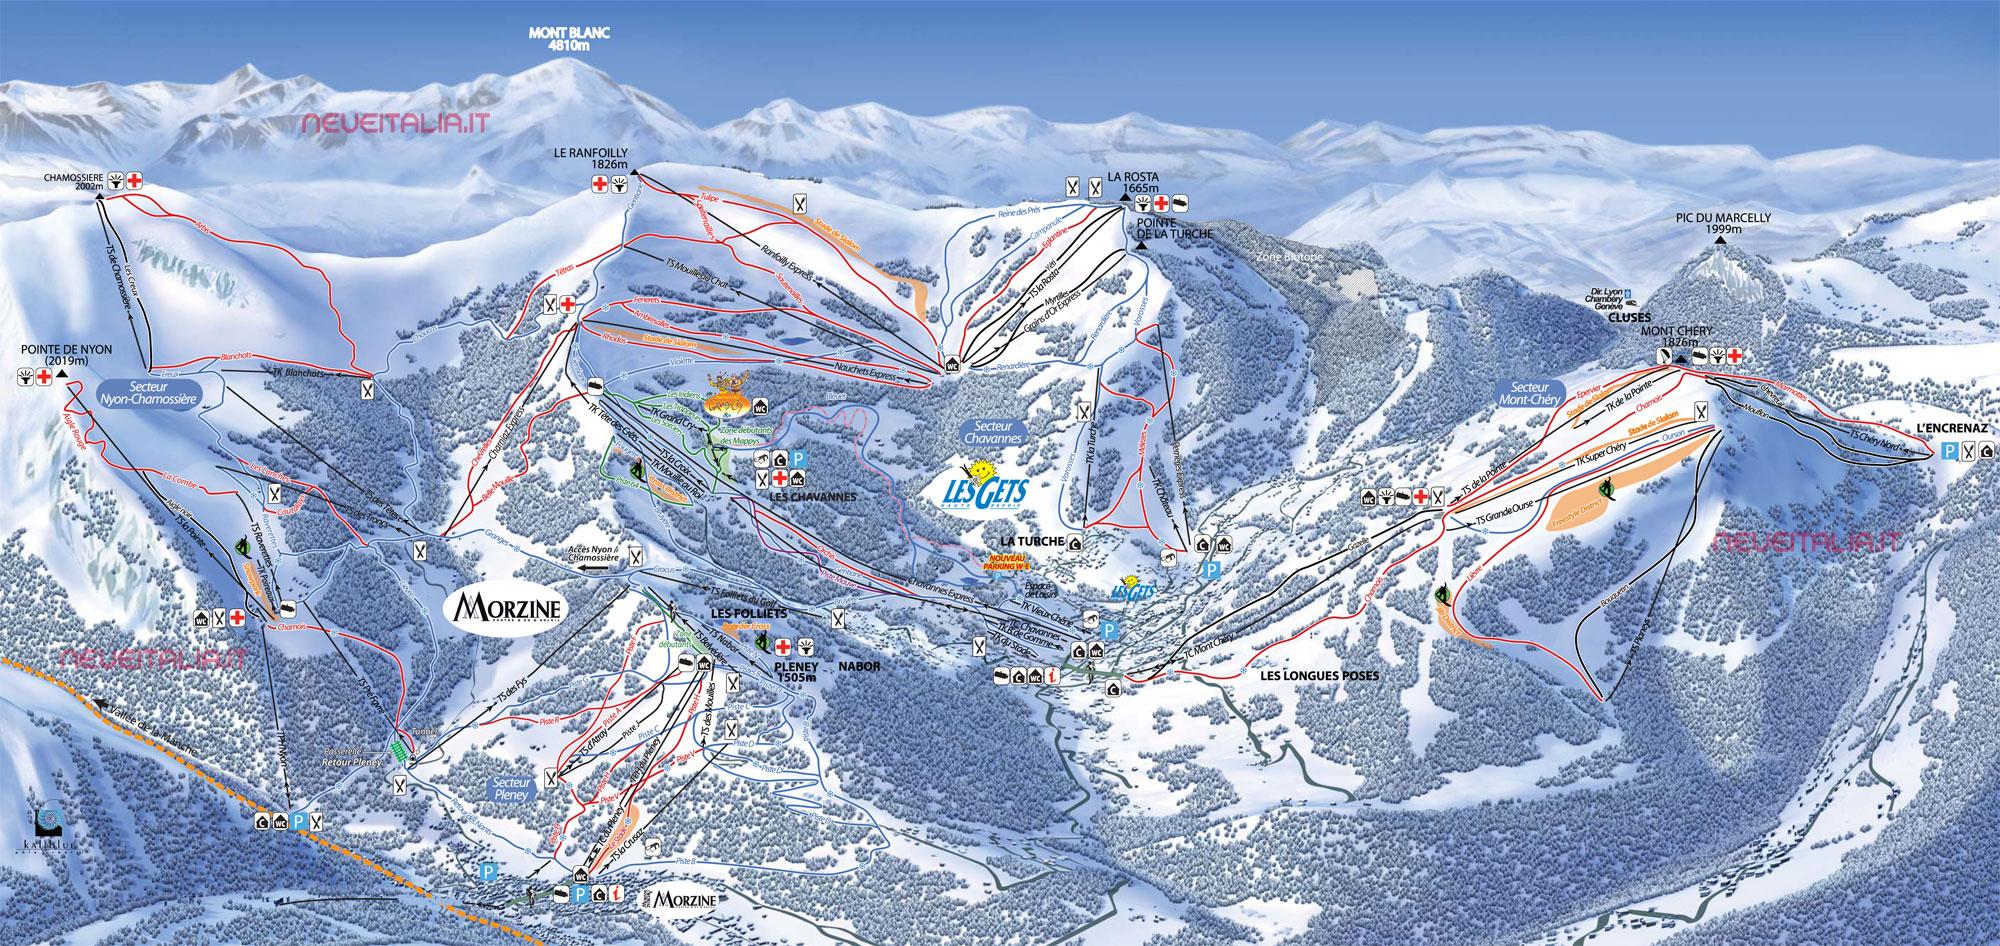 Kitzbuhel piste maps Ski Club of Great